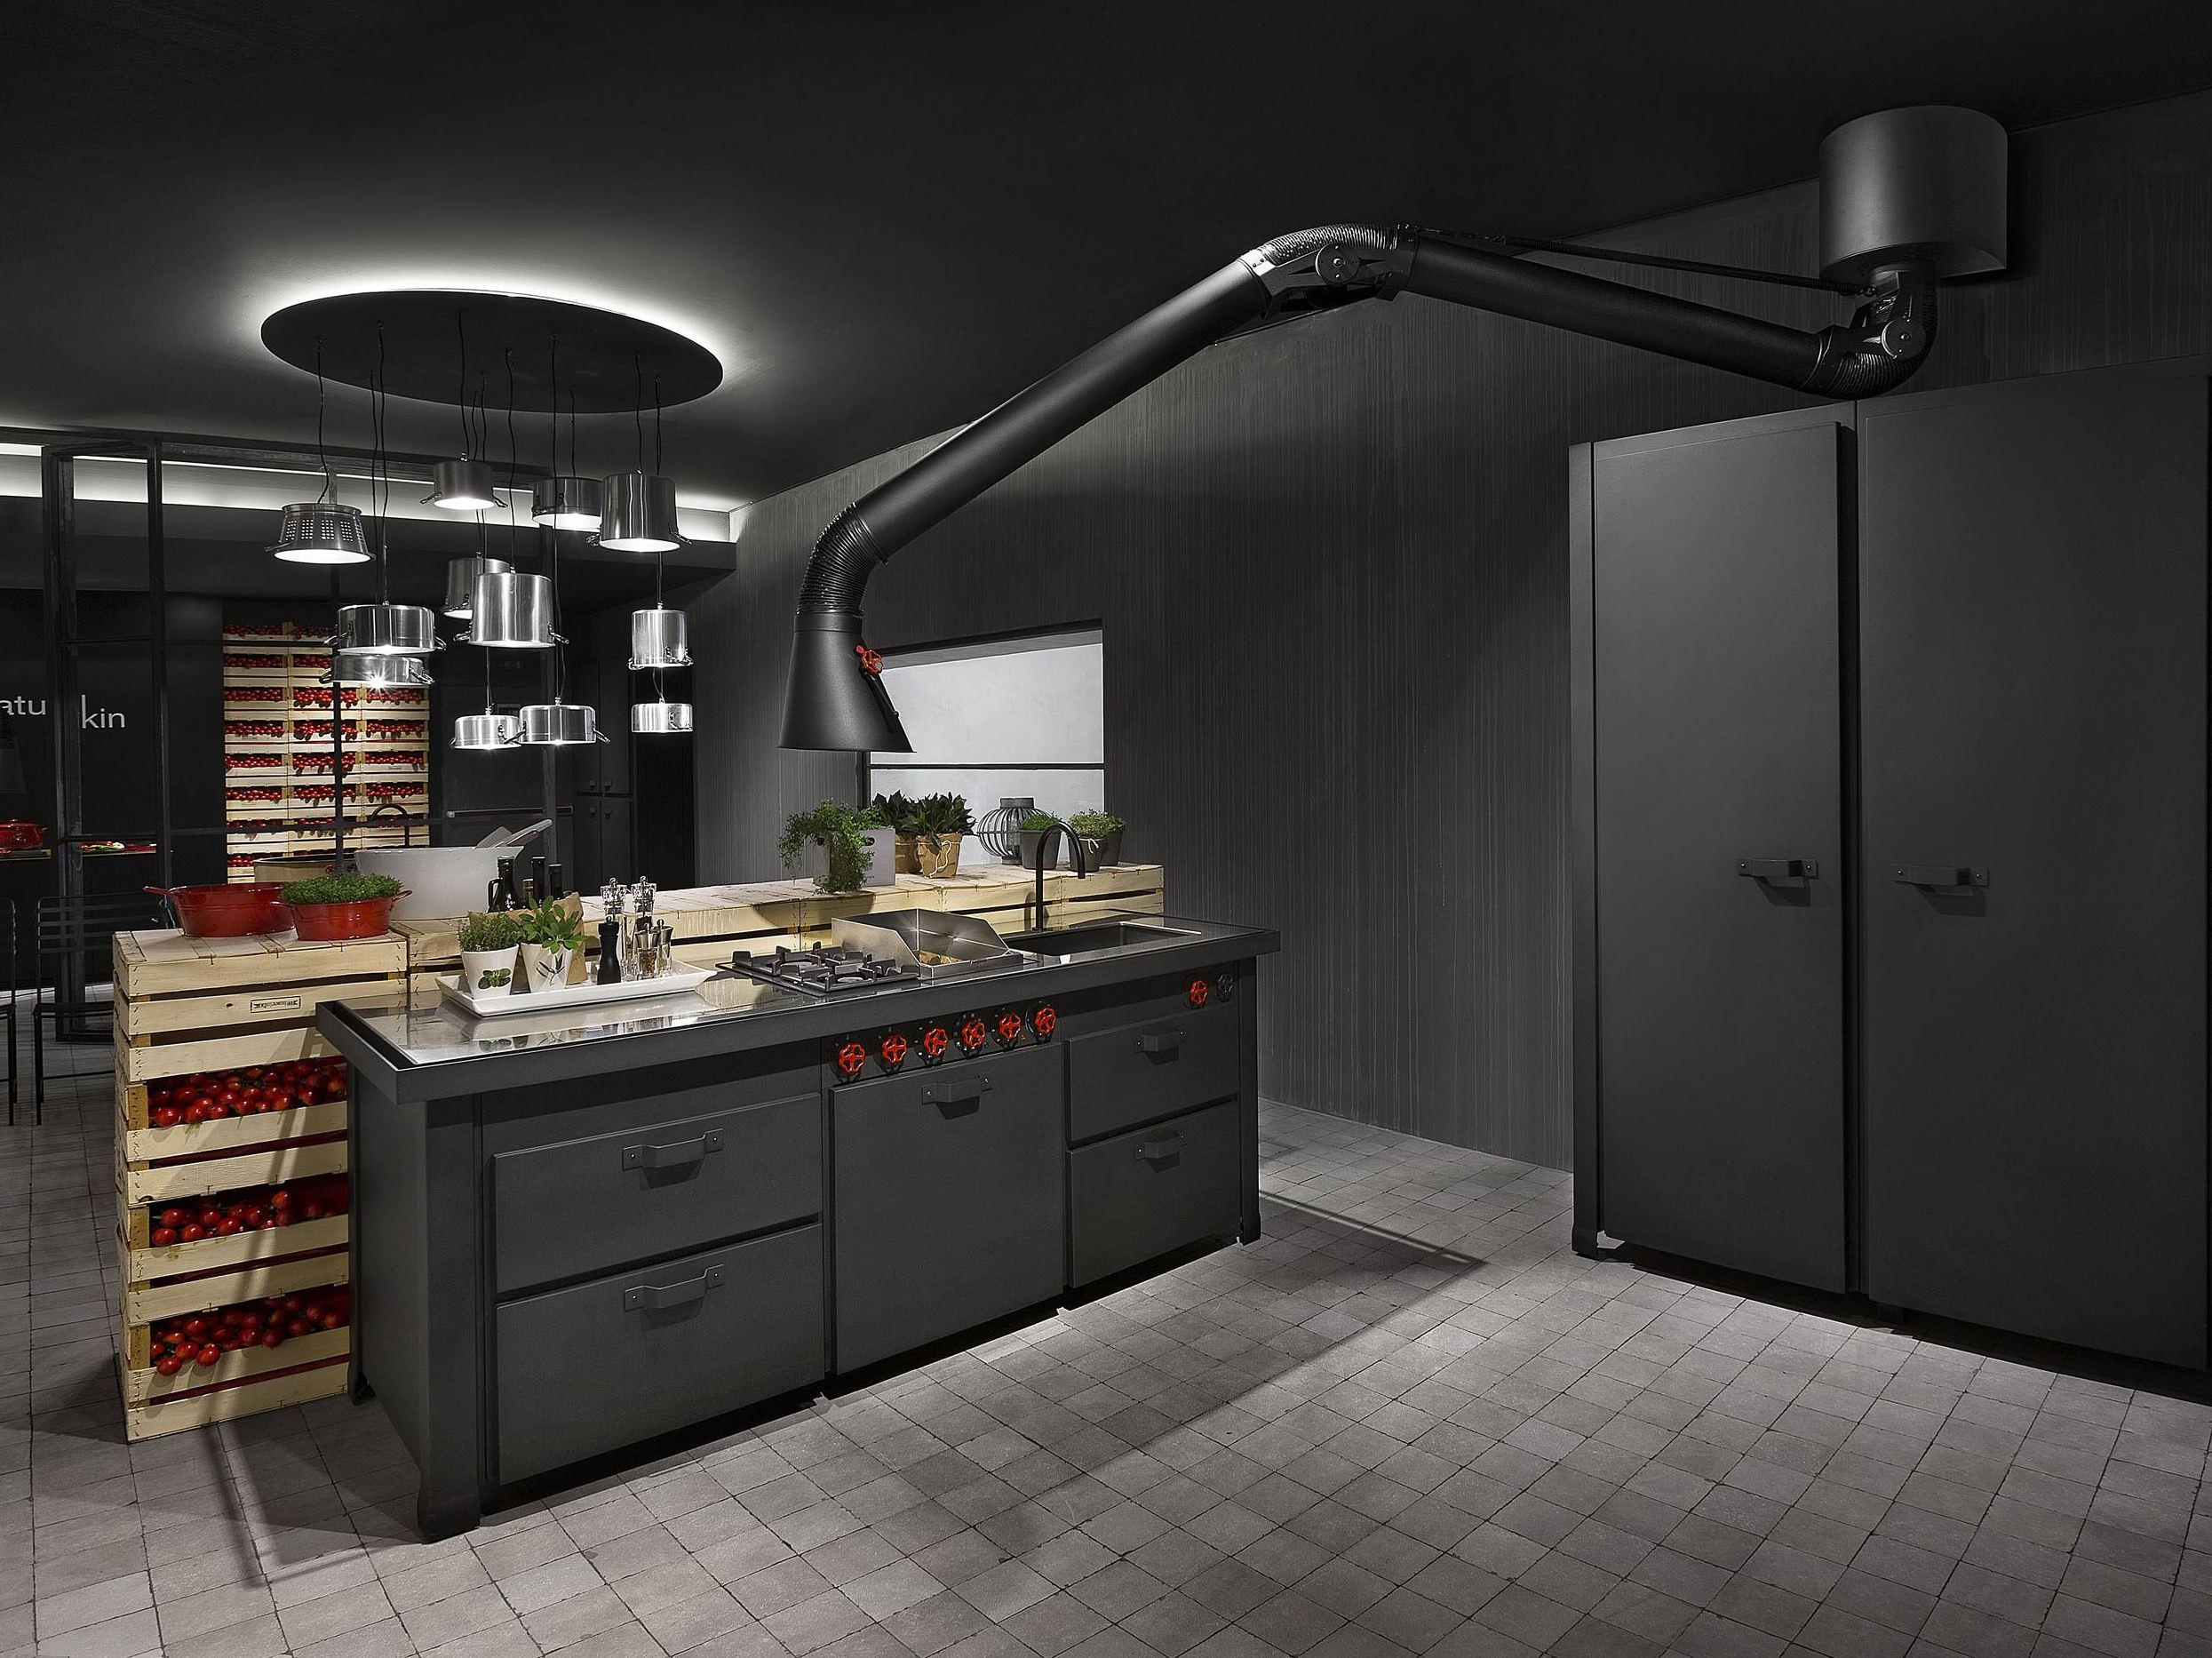 Emejing Cappa Cucina Design Pictures - Design & Ideas 2017 - candp.us